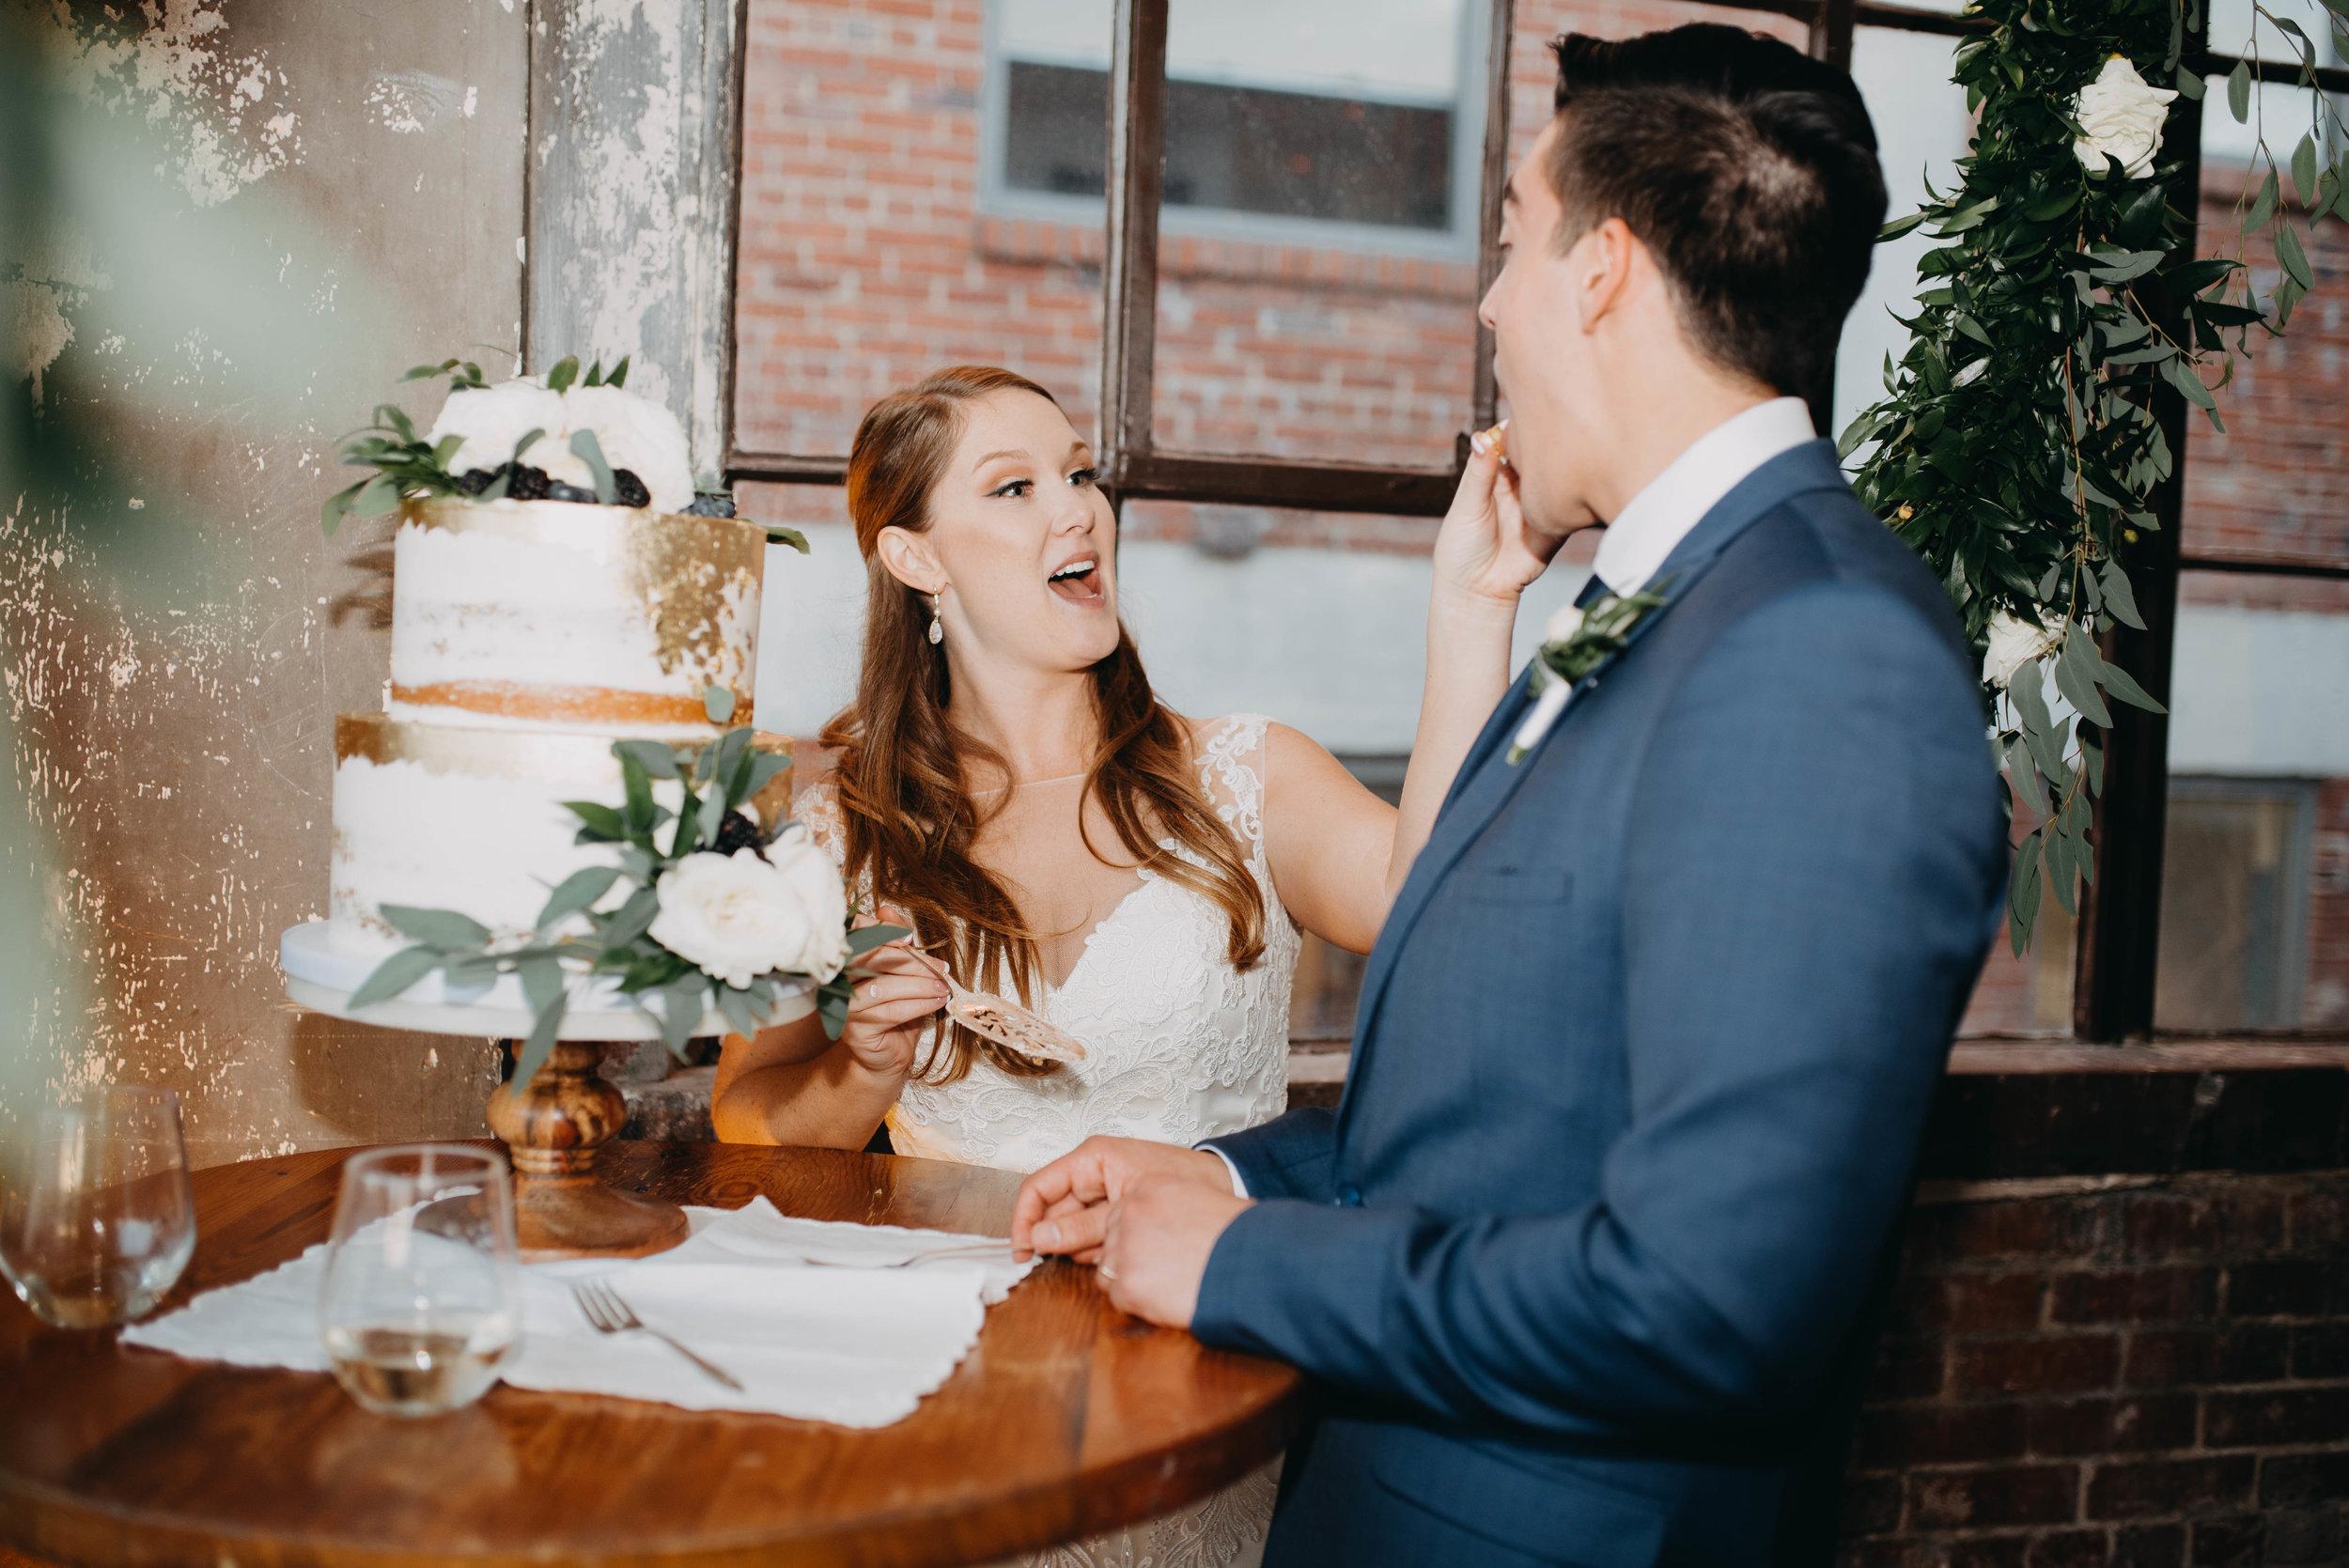 Wedding Cake Bakery in Kansas City